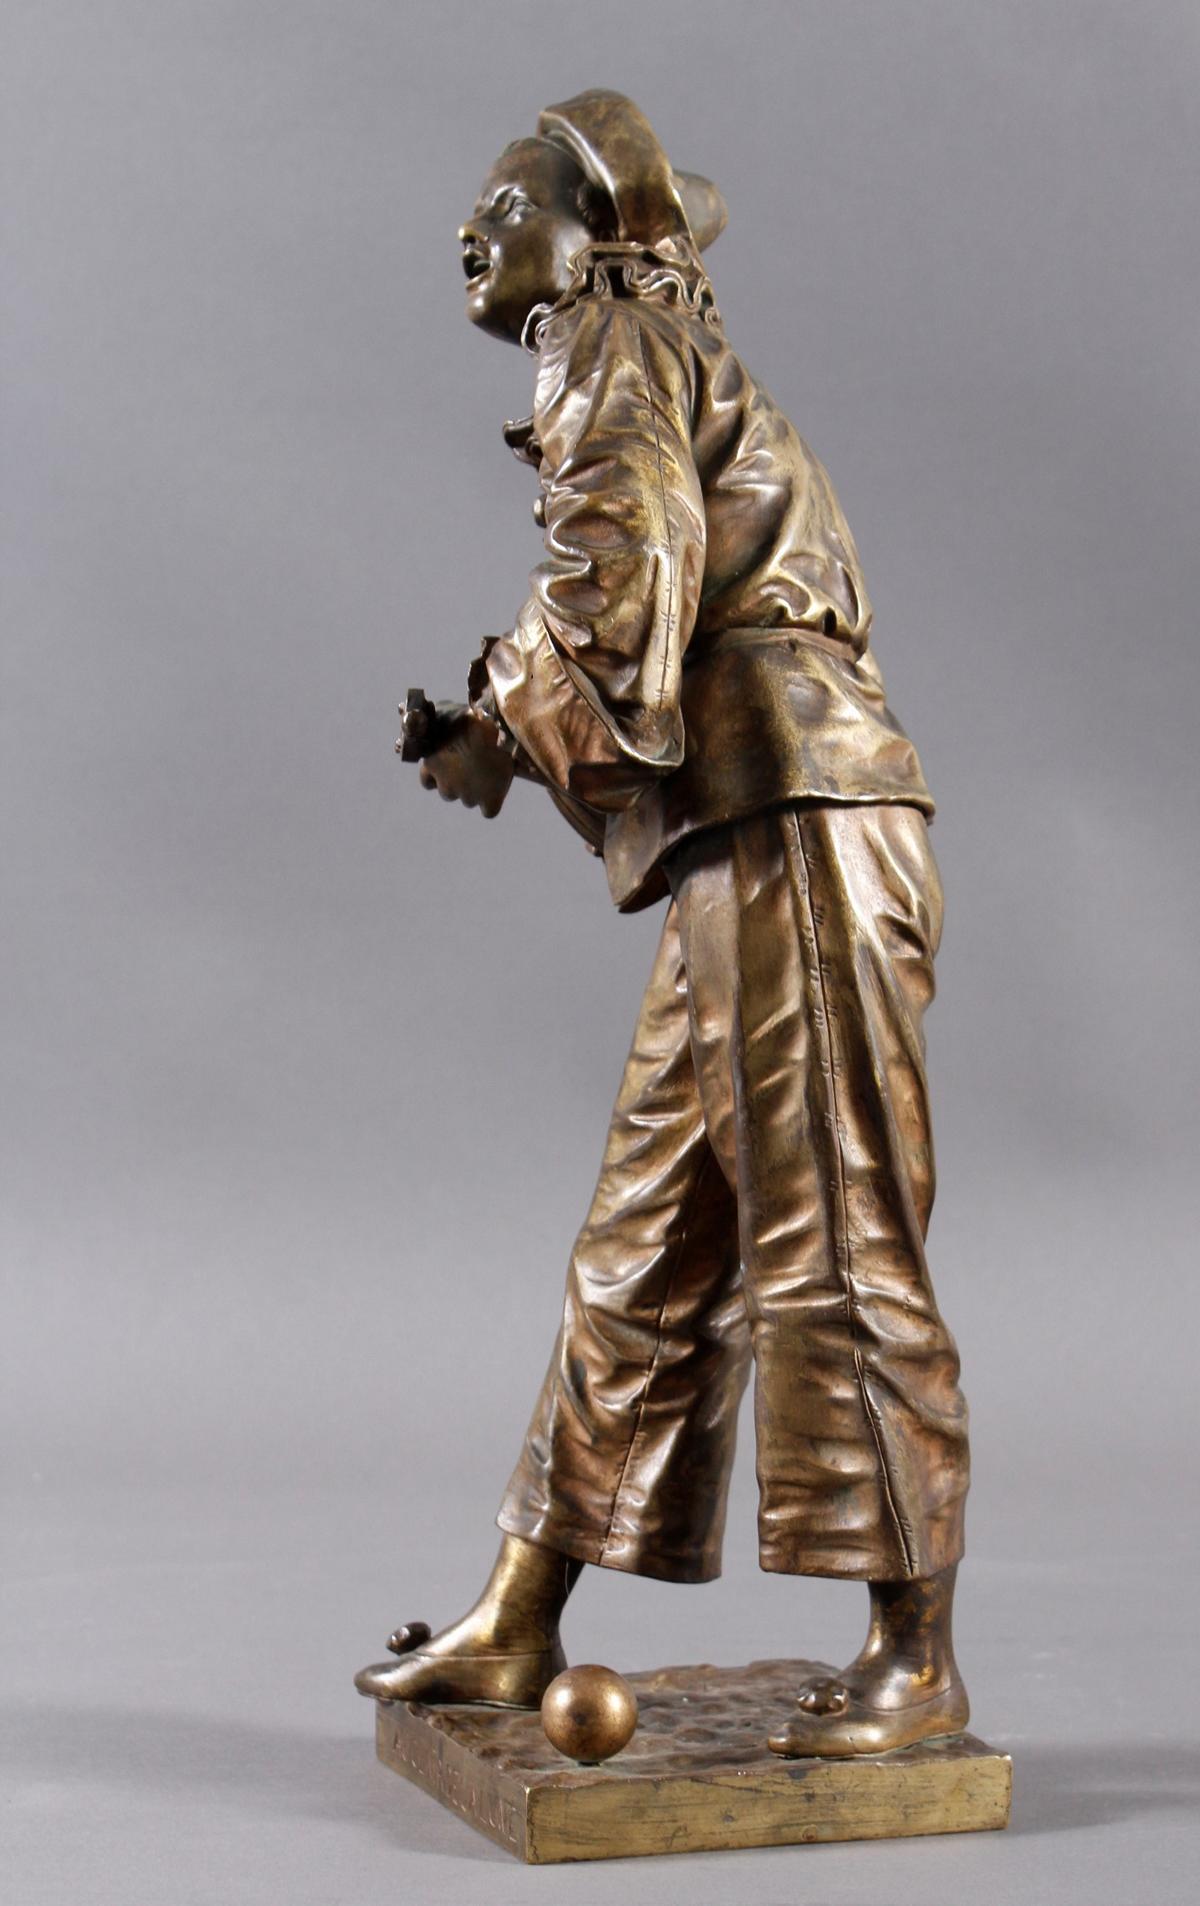 Eutrope Bouret (1833-1906), Bronzeskulptur 'Au claire de la Lune' um 1890/1900-5